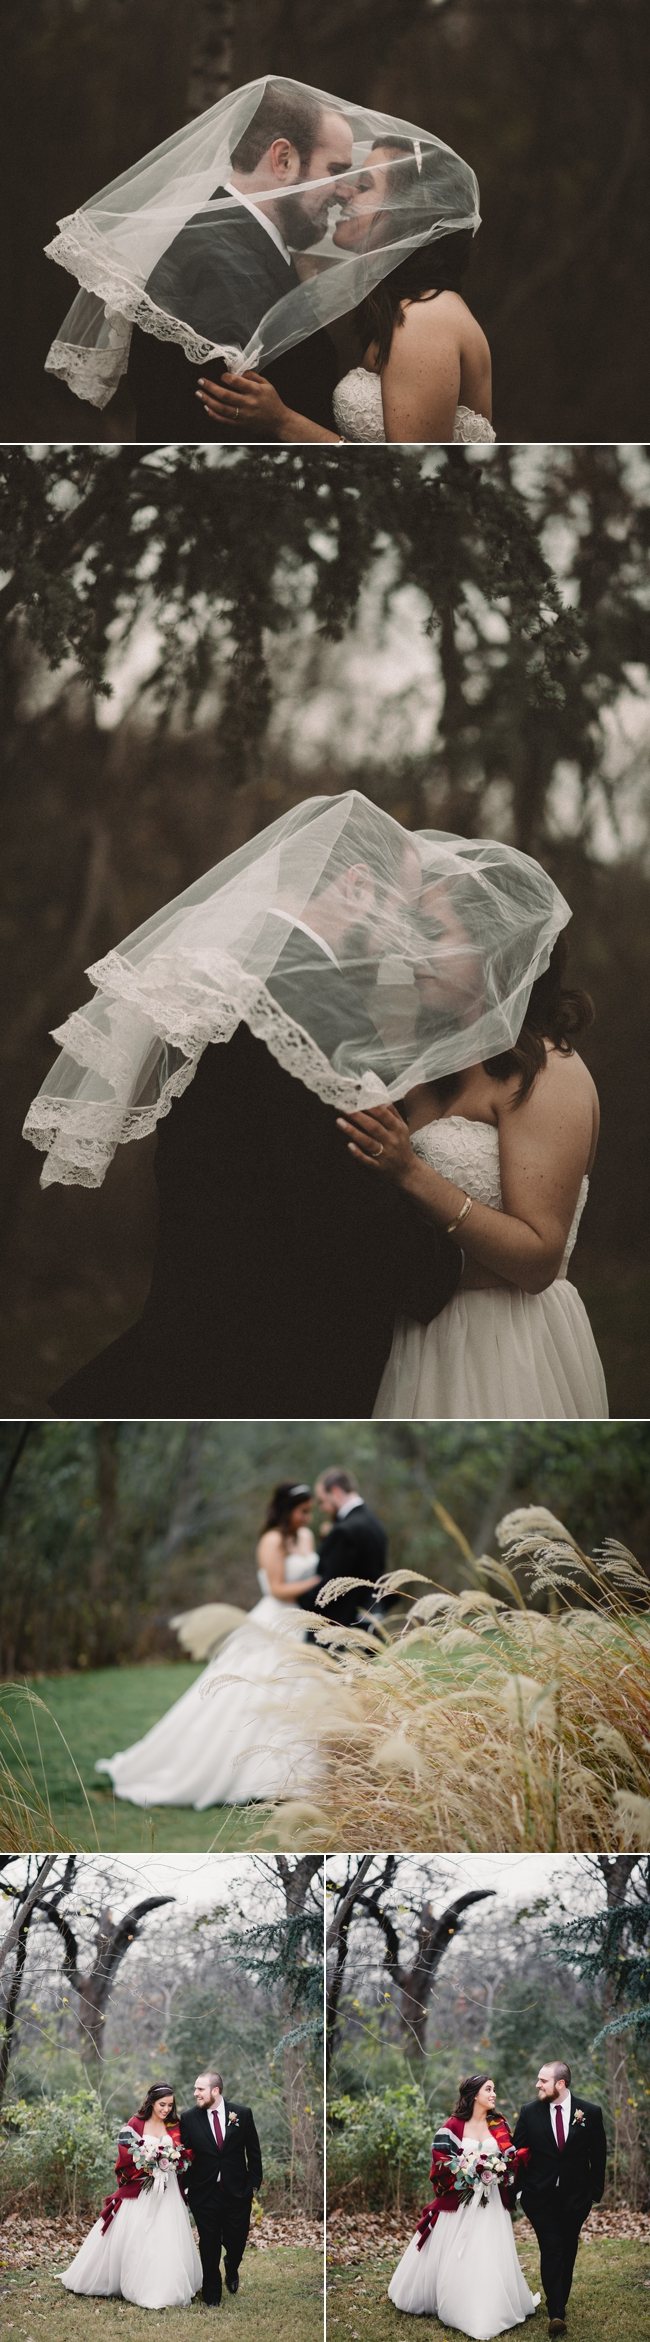 destination-wedding-photographer 6.jpg